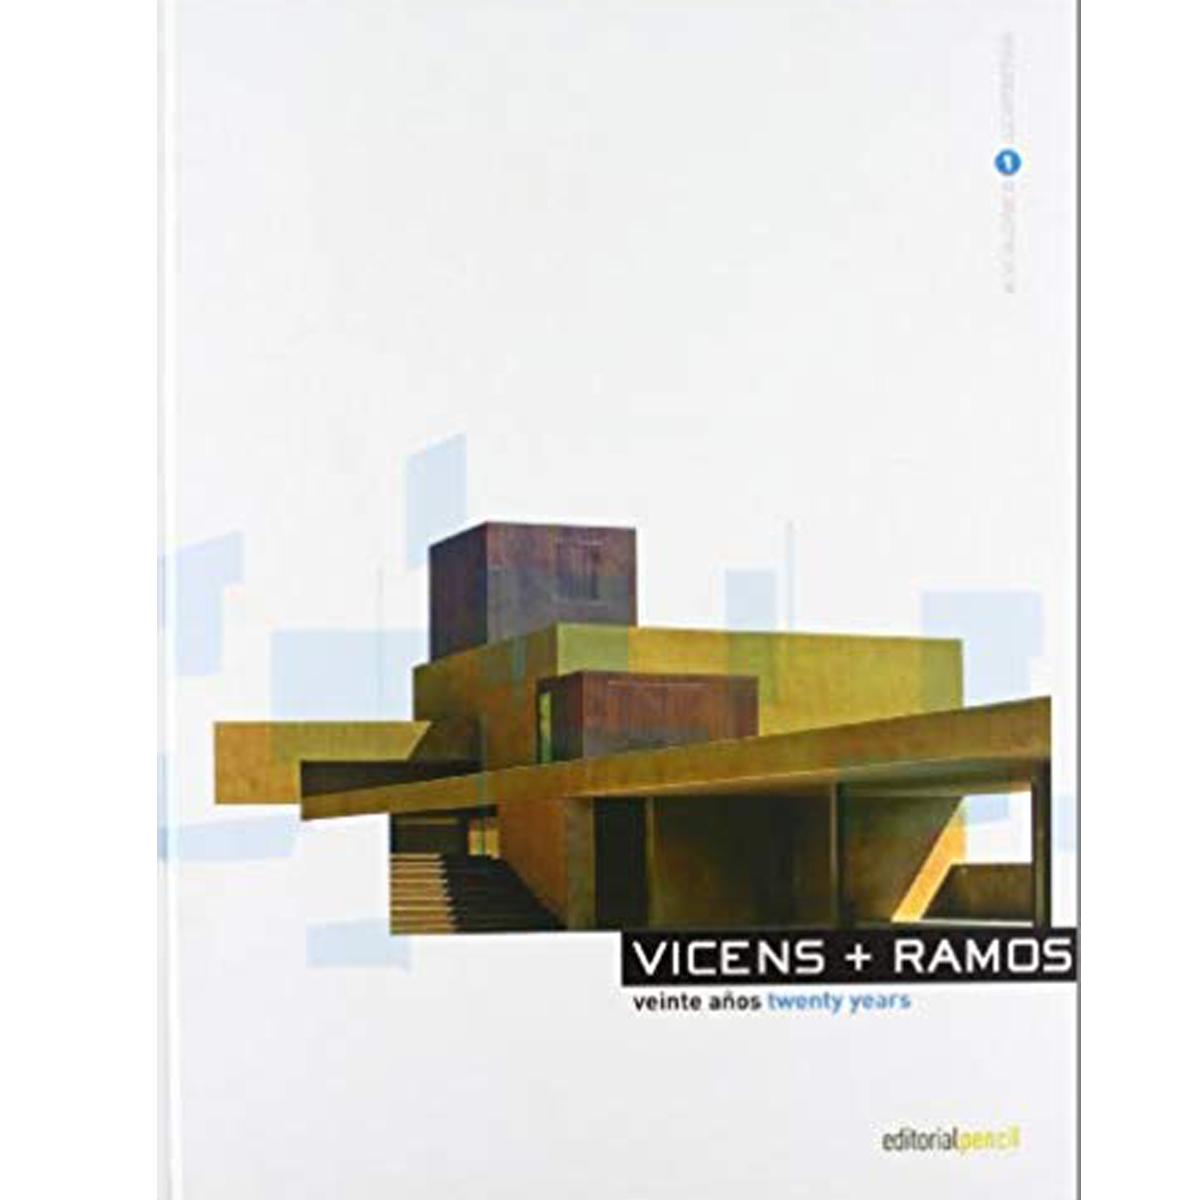 Vicens + Ramos